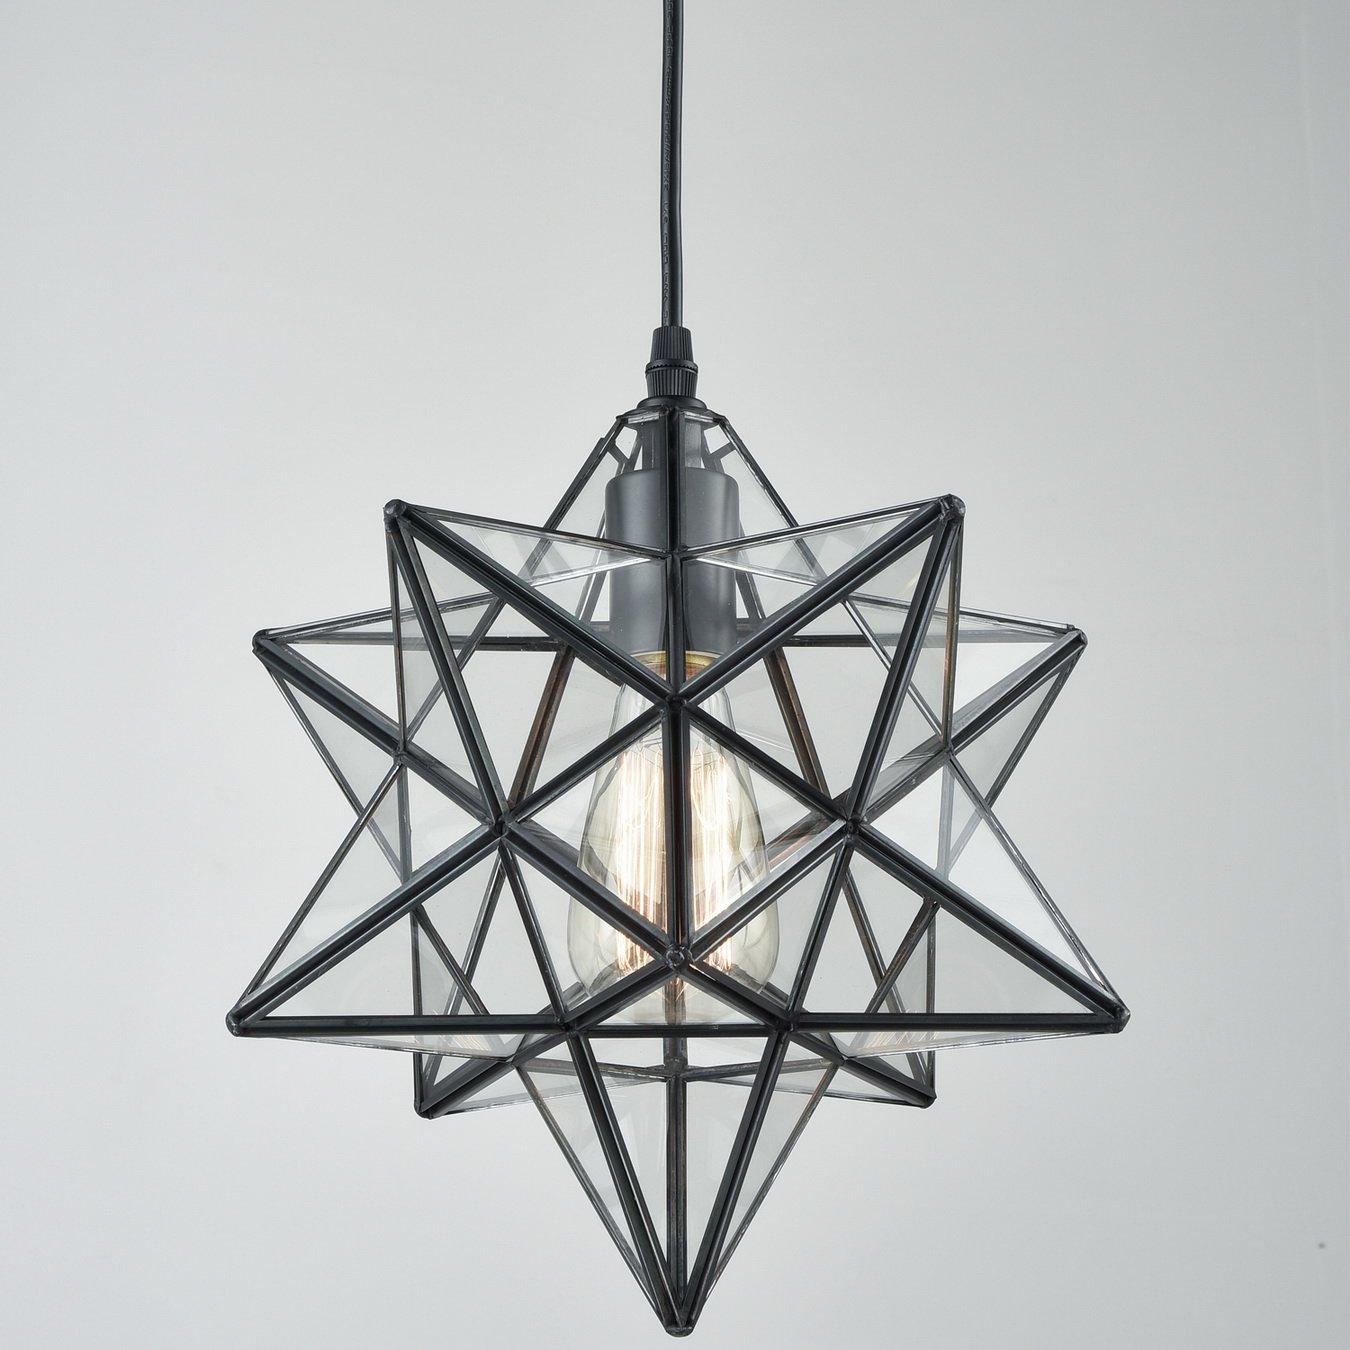 yobo lighting transparent glass moravian star pendant chandelier 12 inch 735980997391 ebay. Black Bedroom Furniture Sets. Home Design Ideas